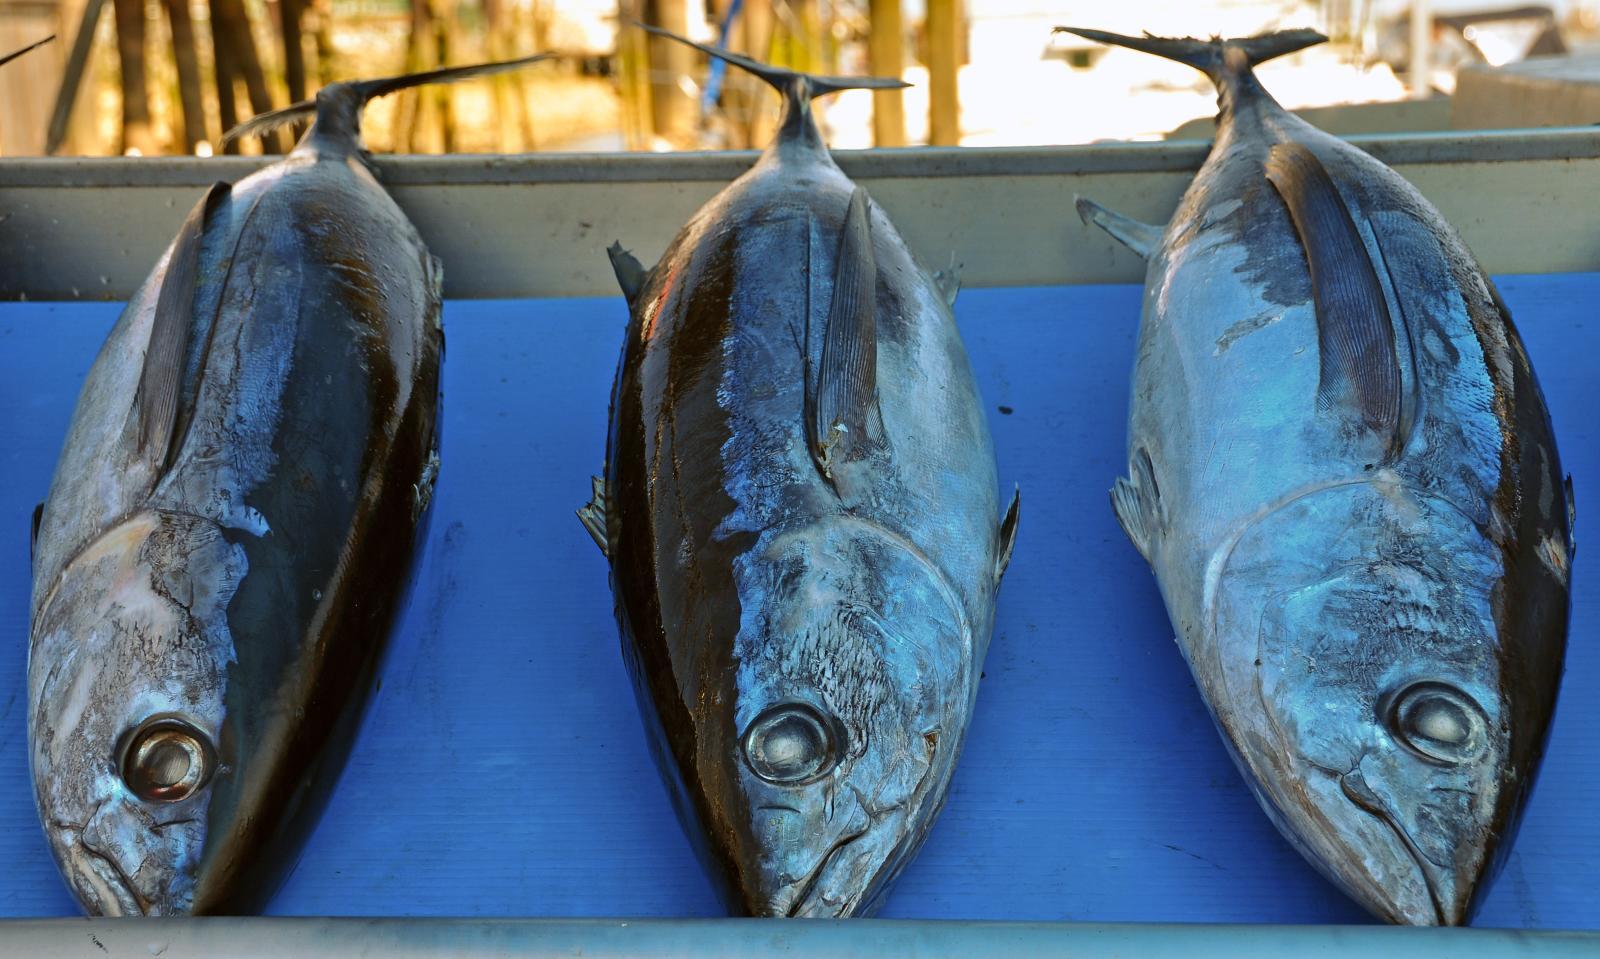 Three albacore tunas